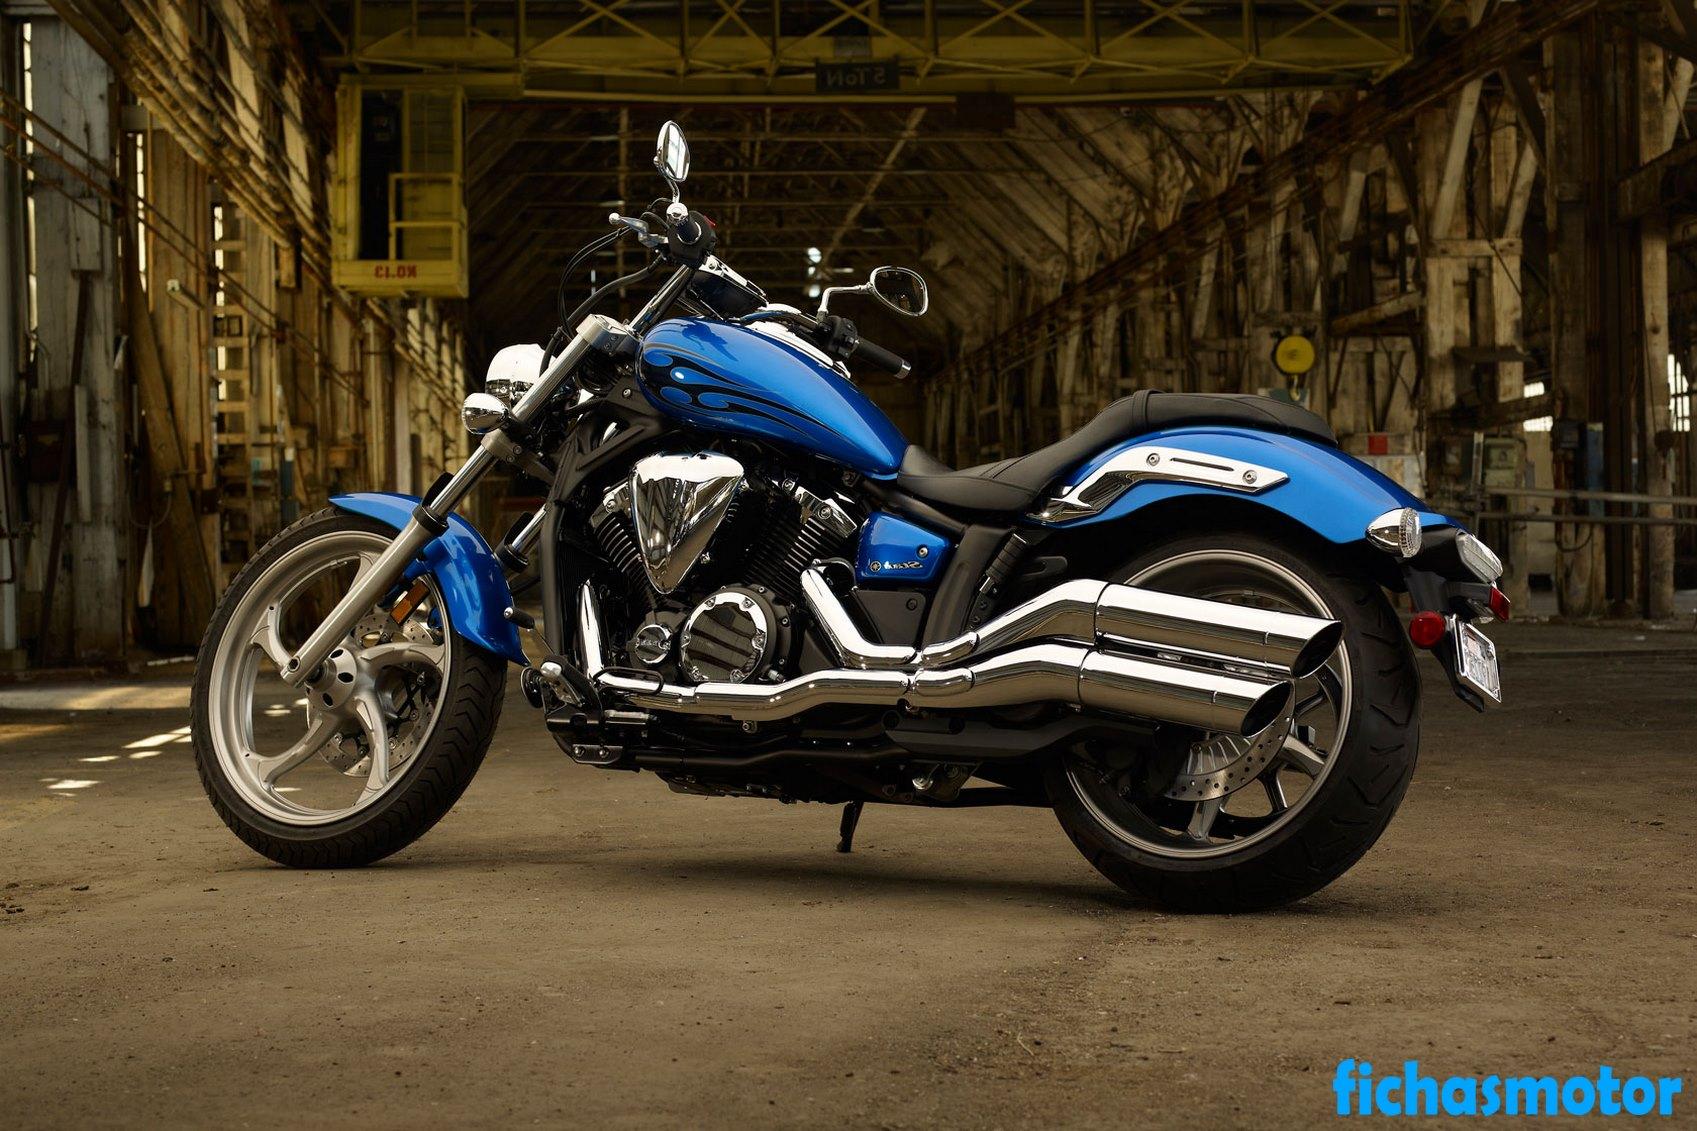 Imagen moto Yamaha stryker año 2011